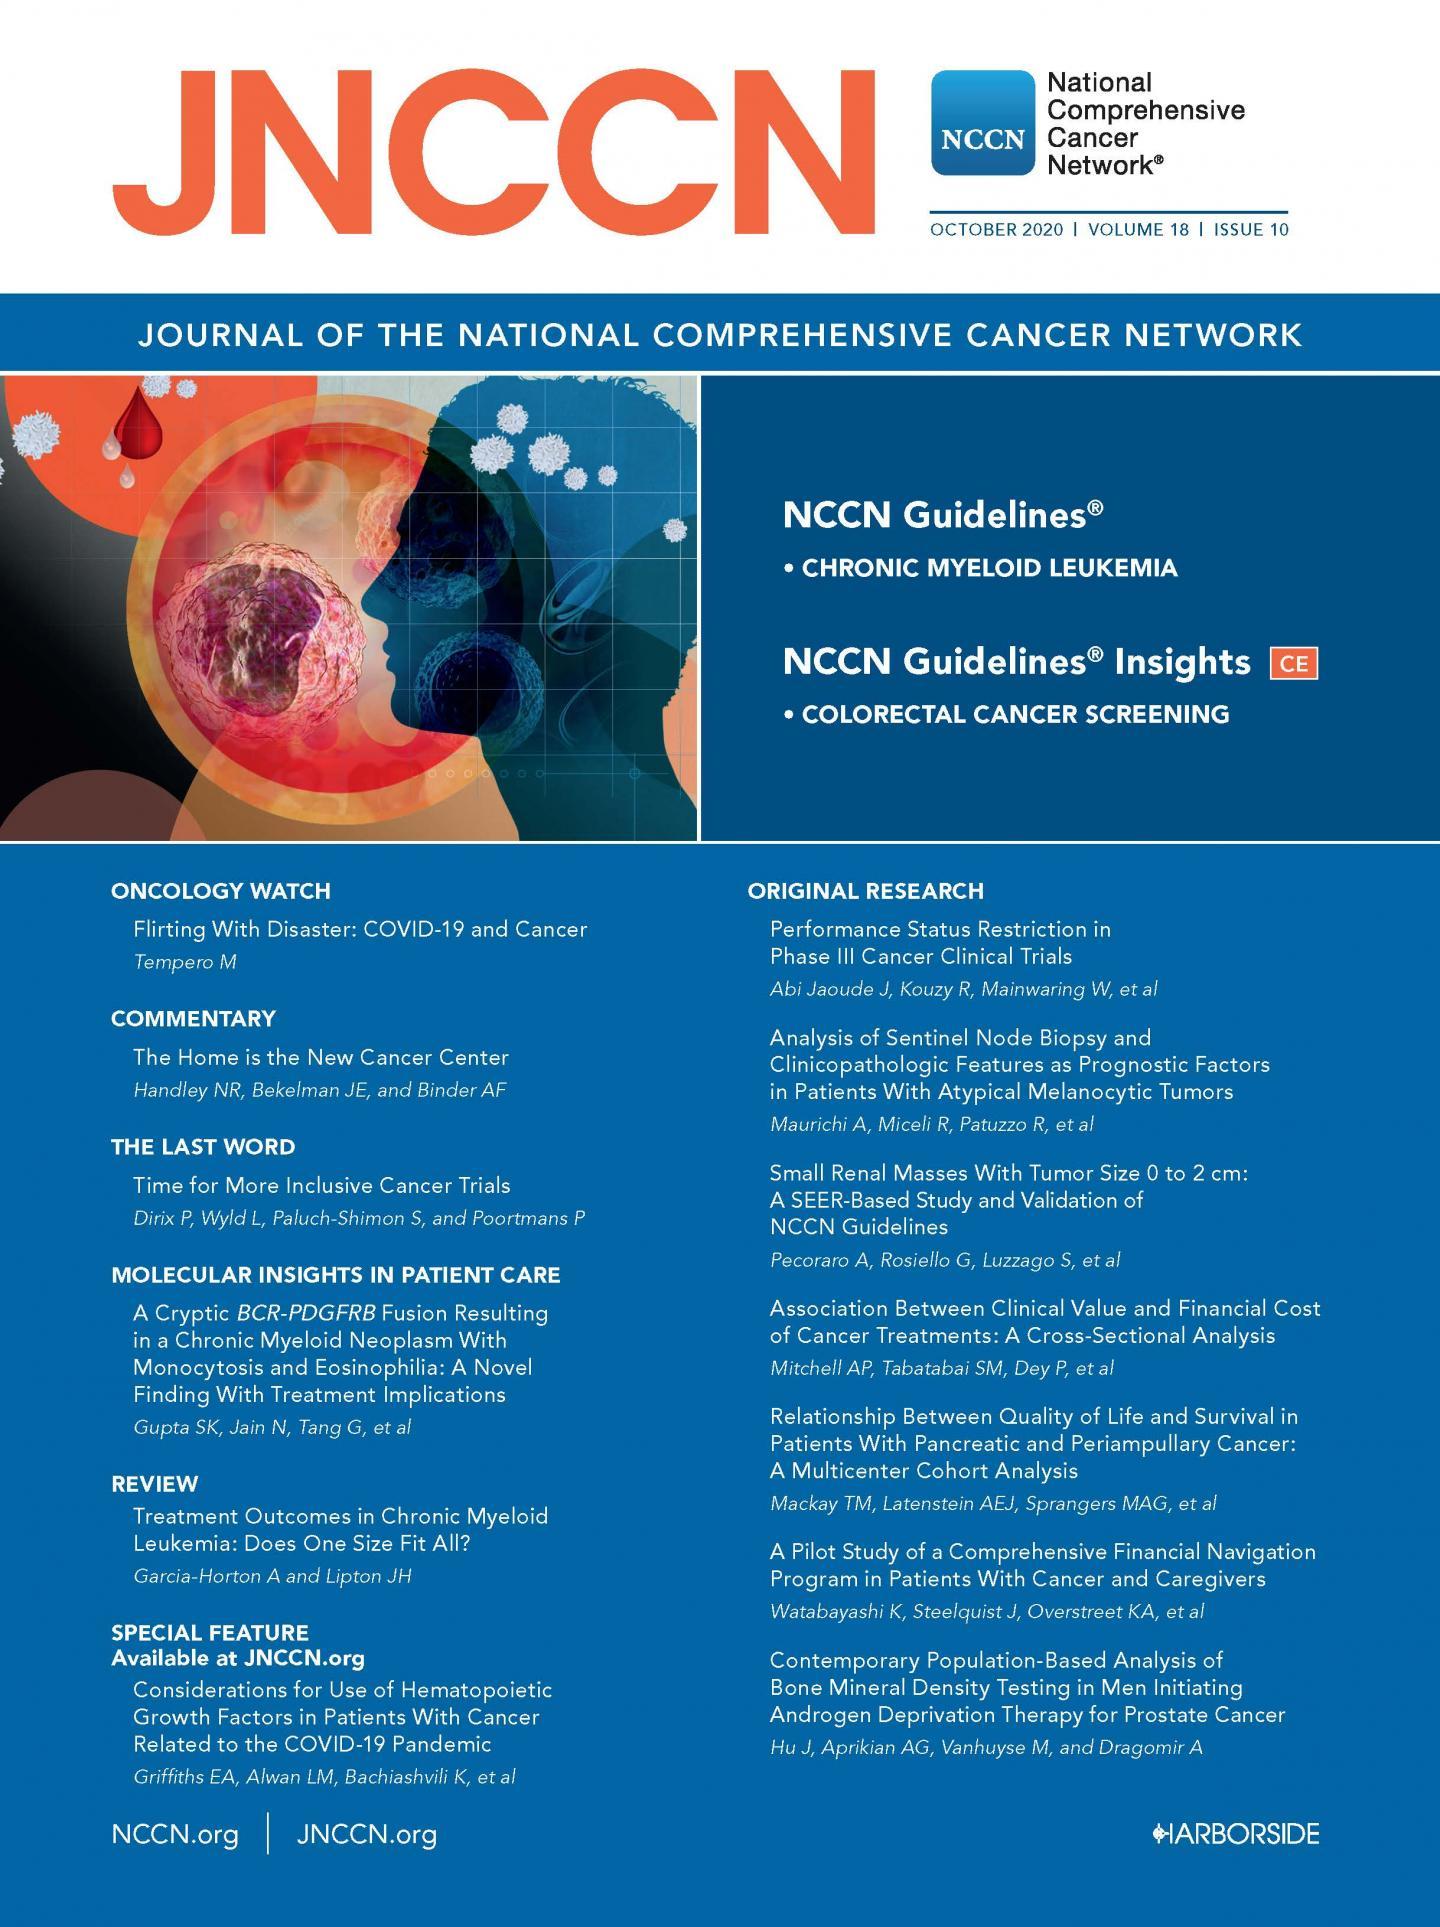 JNCCN October 2020 Cover